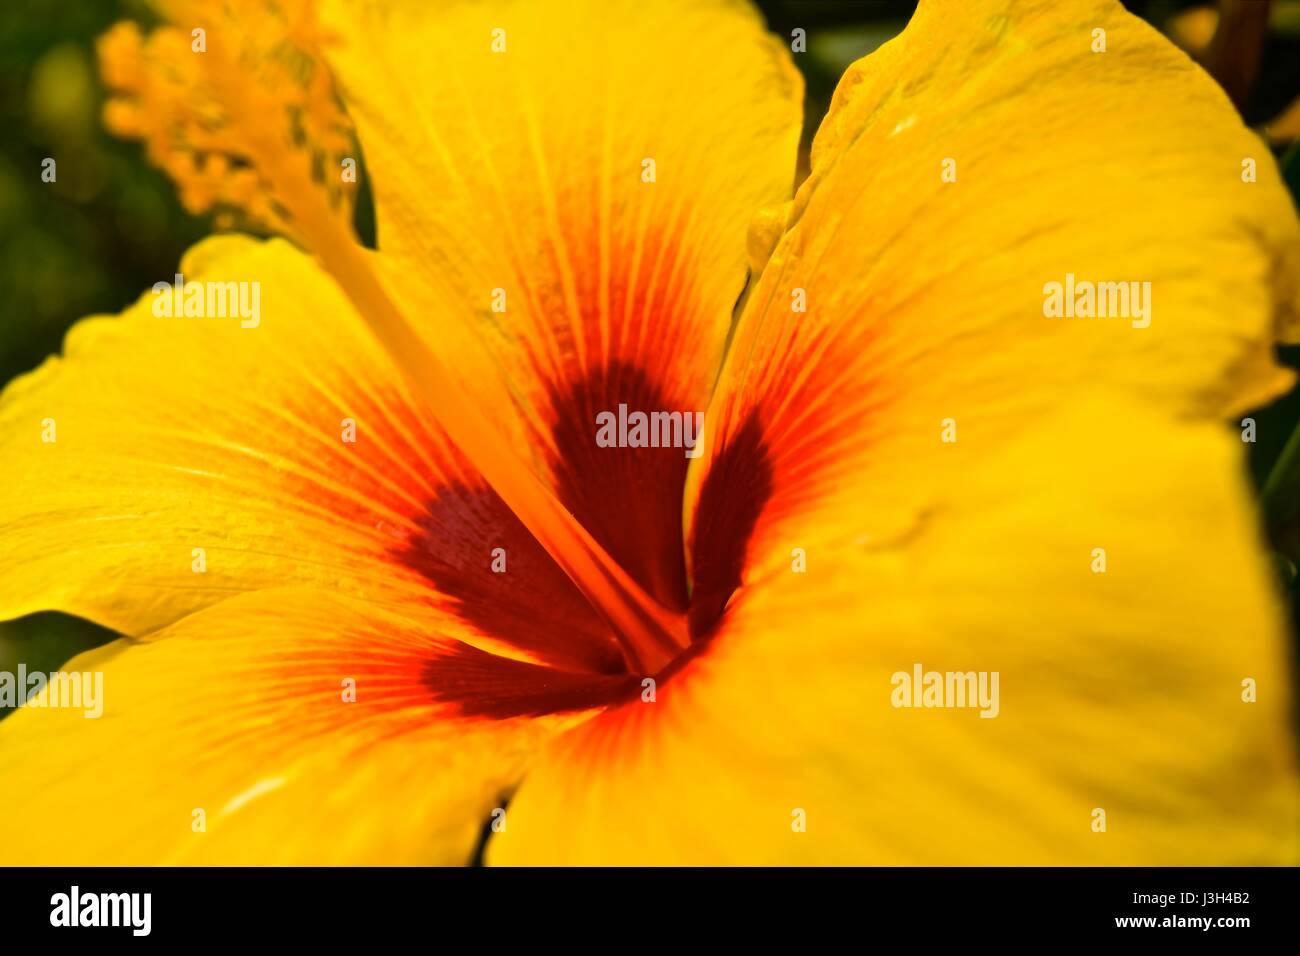 Flower Behind Ear Stock Photos Flower Behind Ear Stock Images Alamy